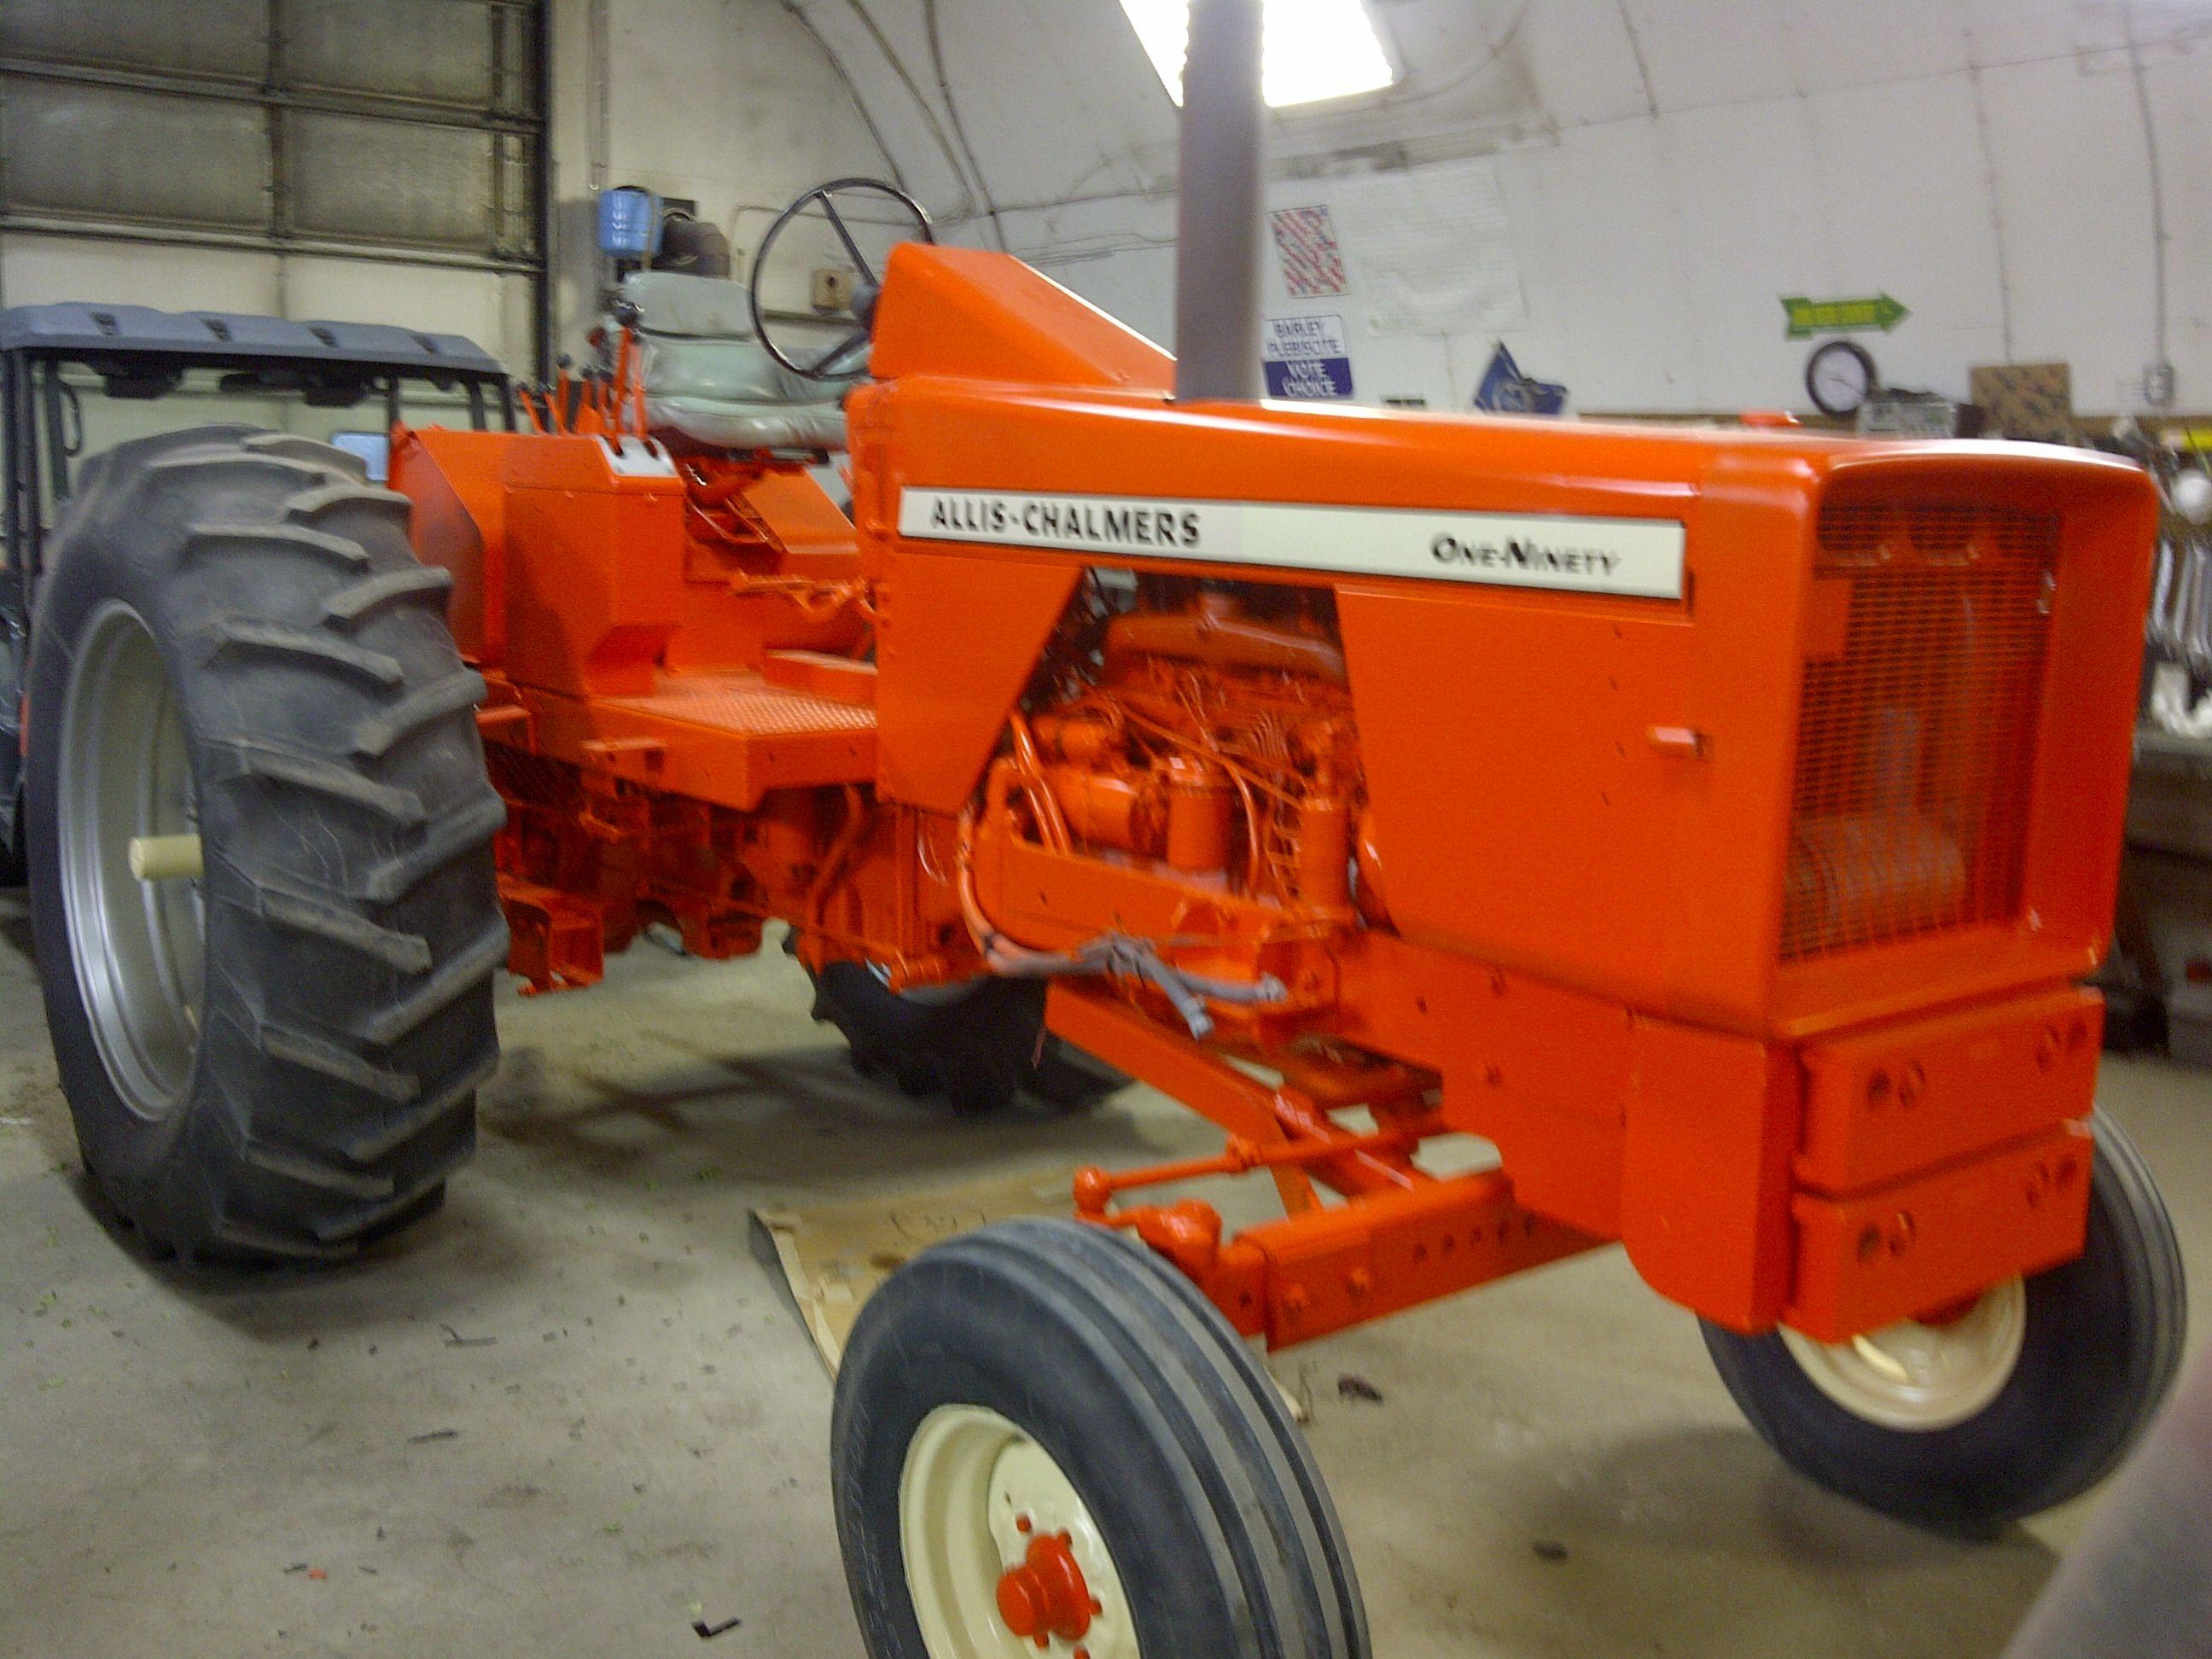 Restoring Some Old Allis Chalmers Tractors | Allis ...